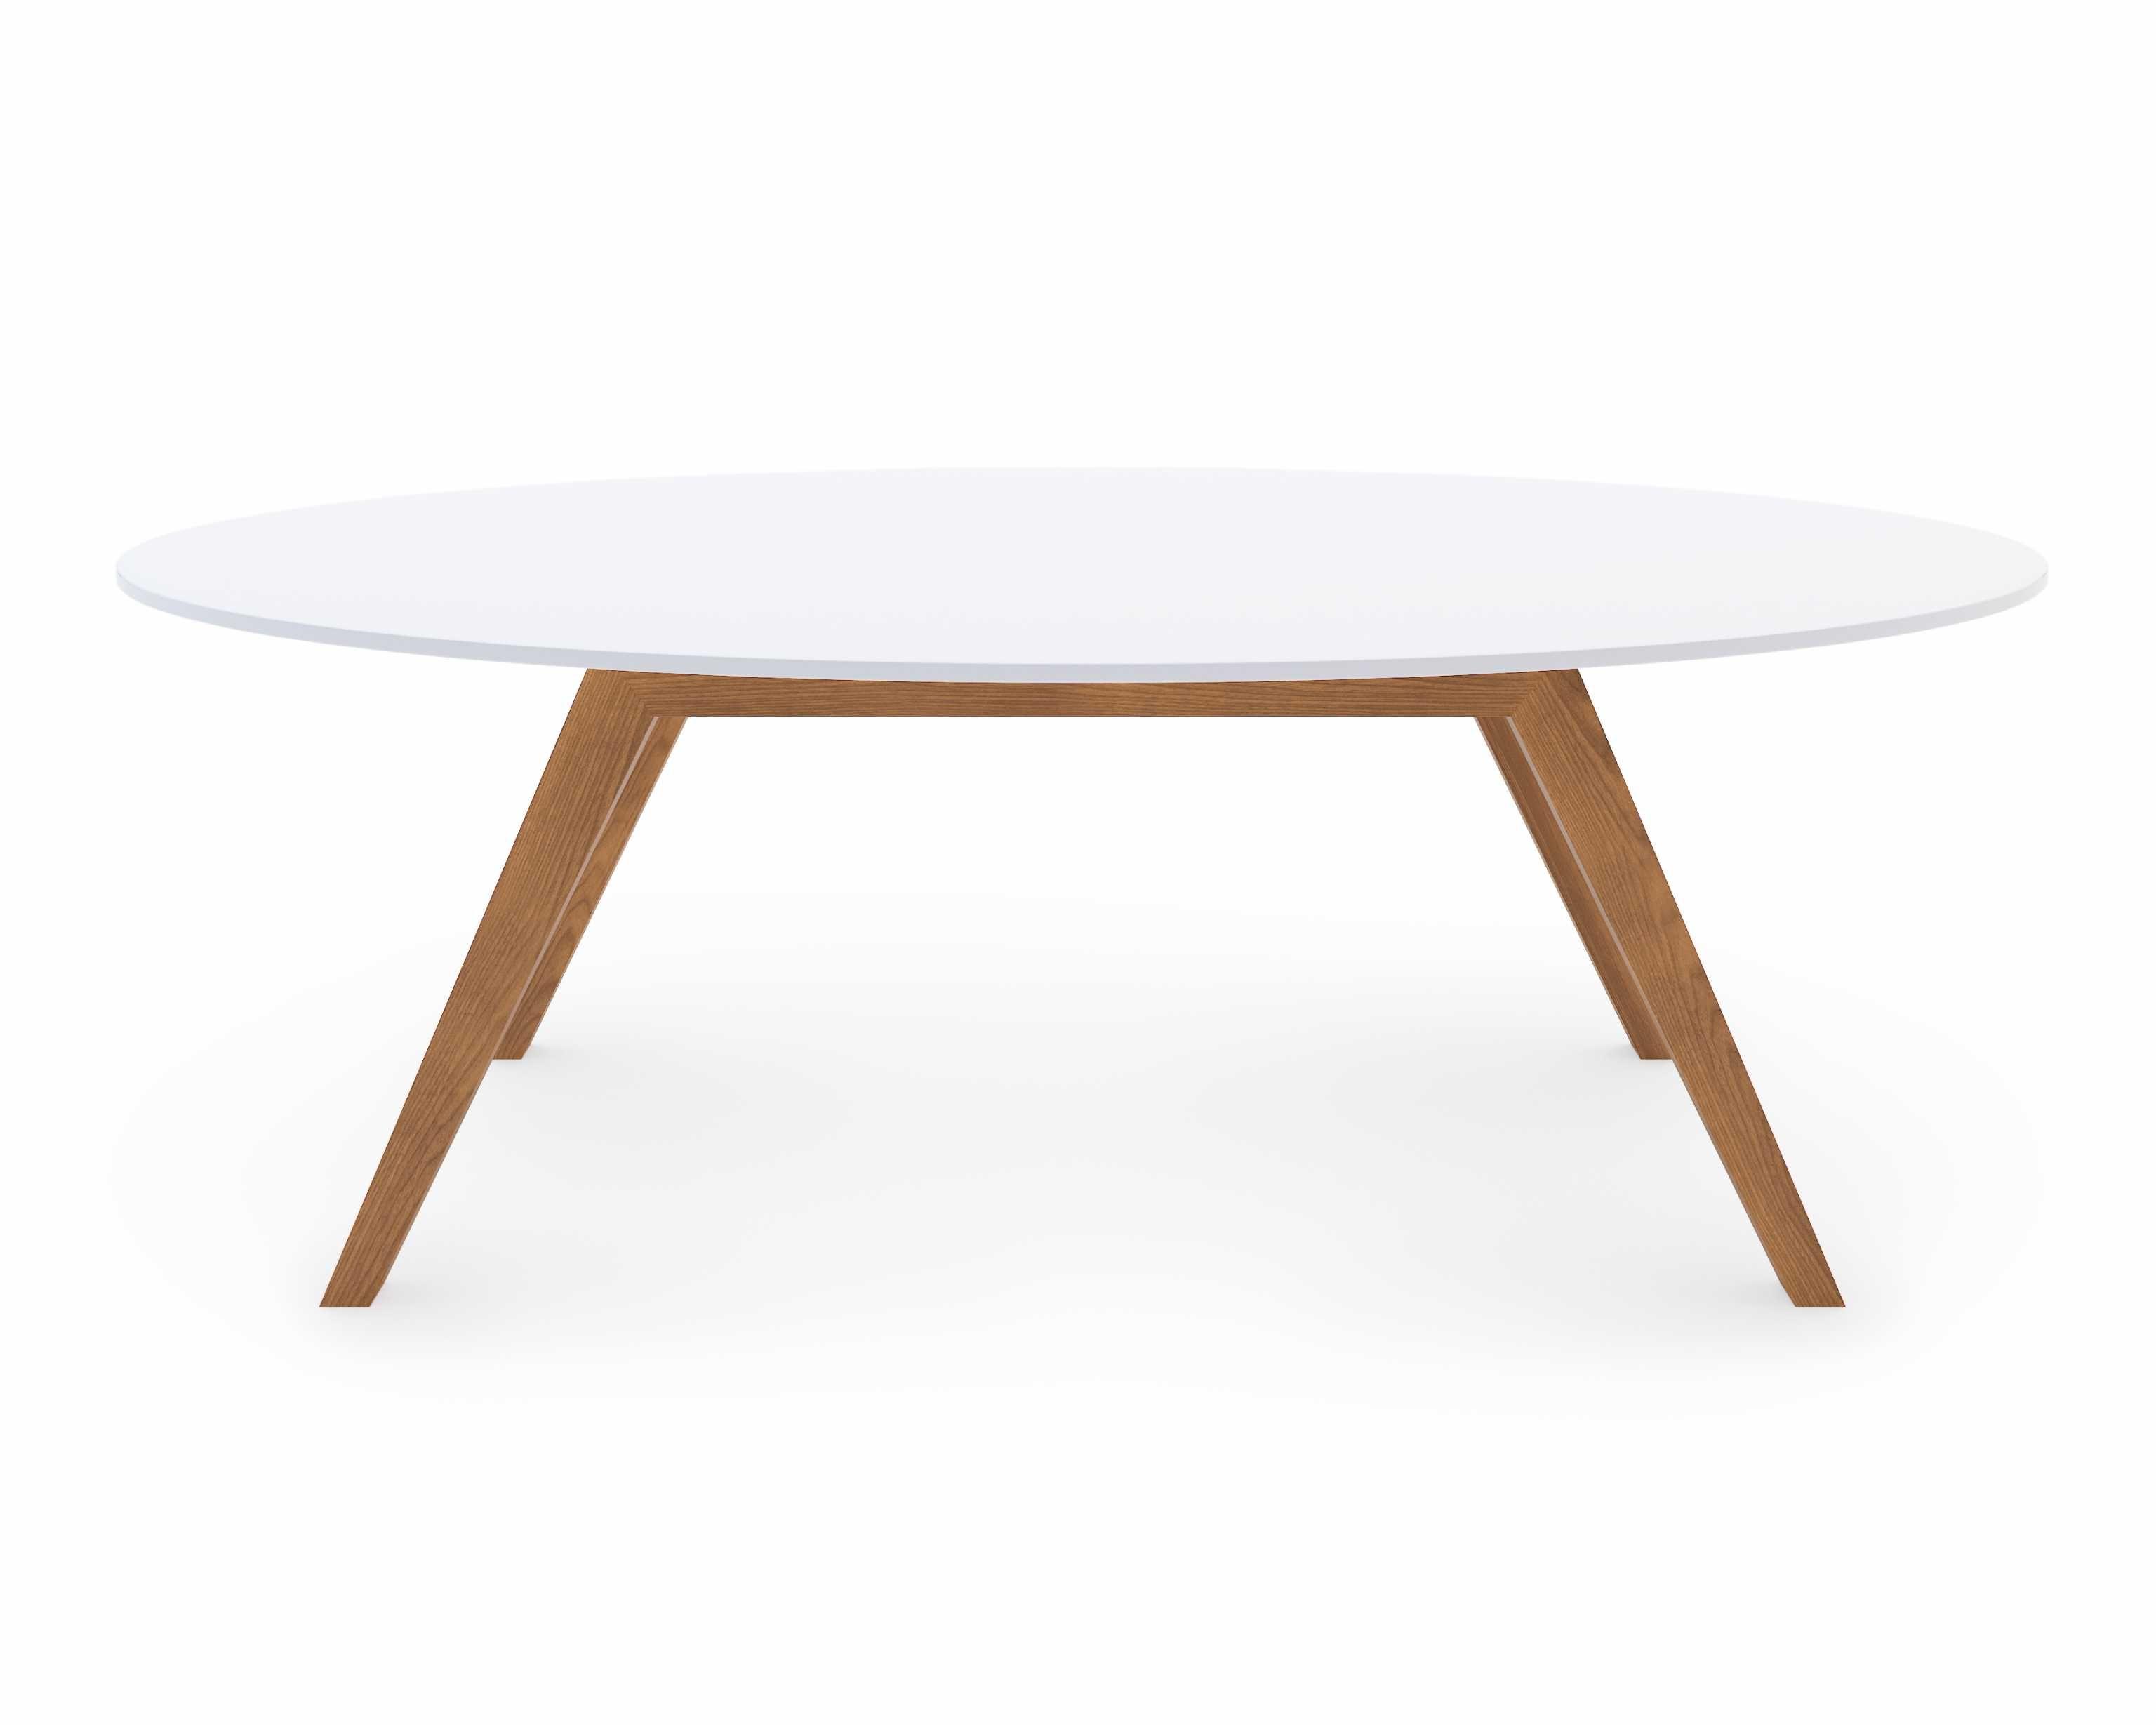 Dolf Coffee Table Rove Kure Scandinavian Design Mid Century Coffee Table Coffee Table Oval Coffee Tables [ 2458 x 3072 Pixel ]